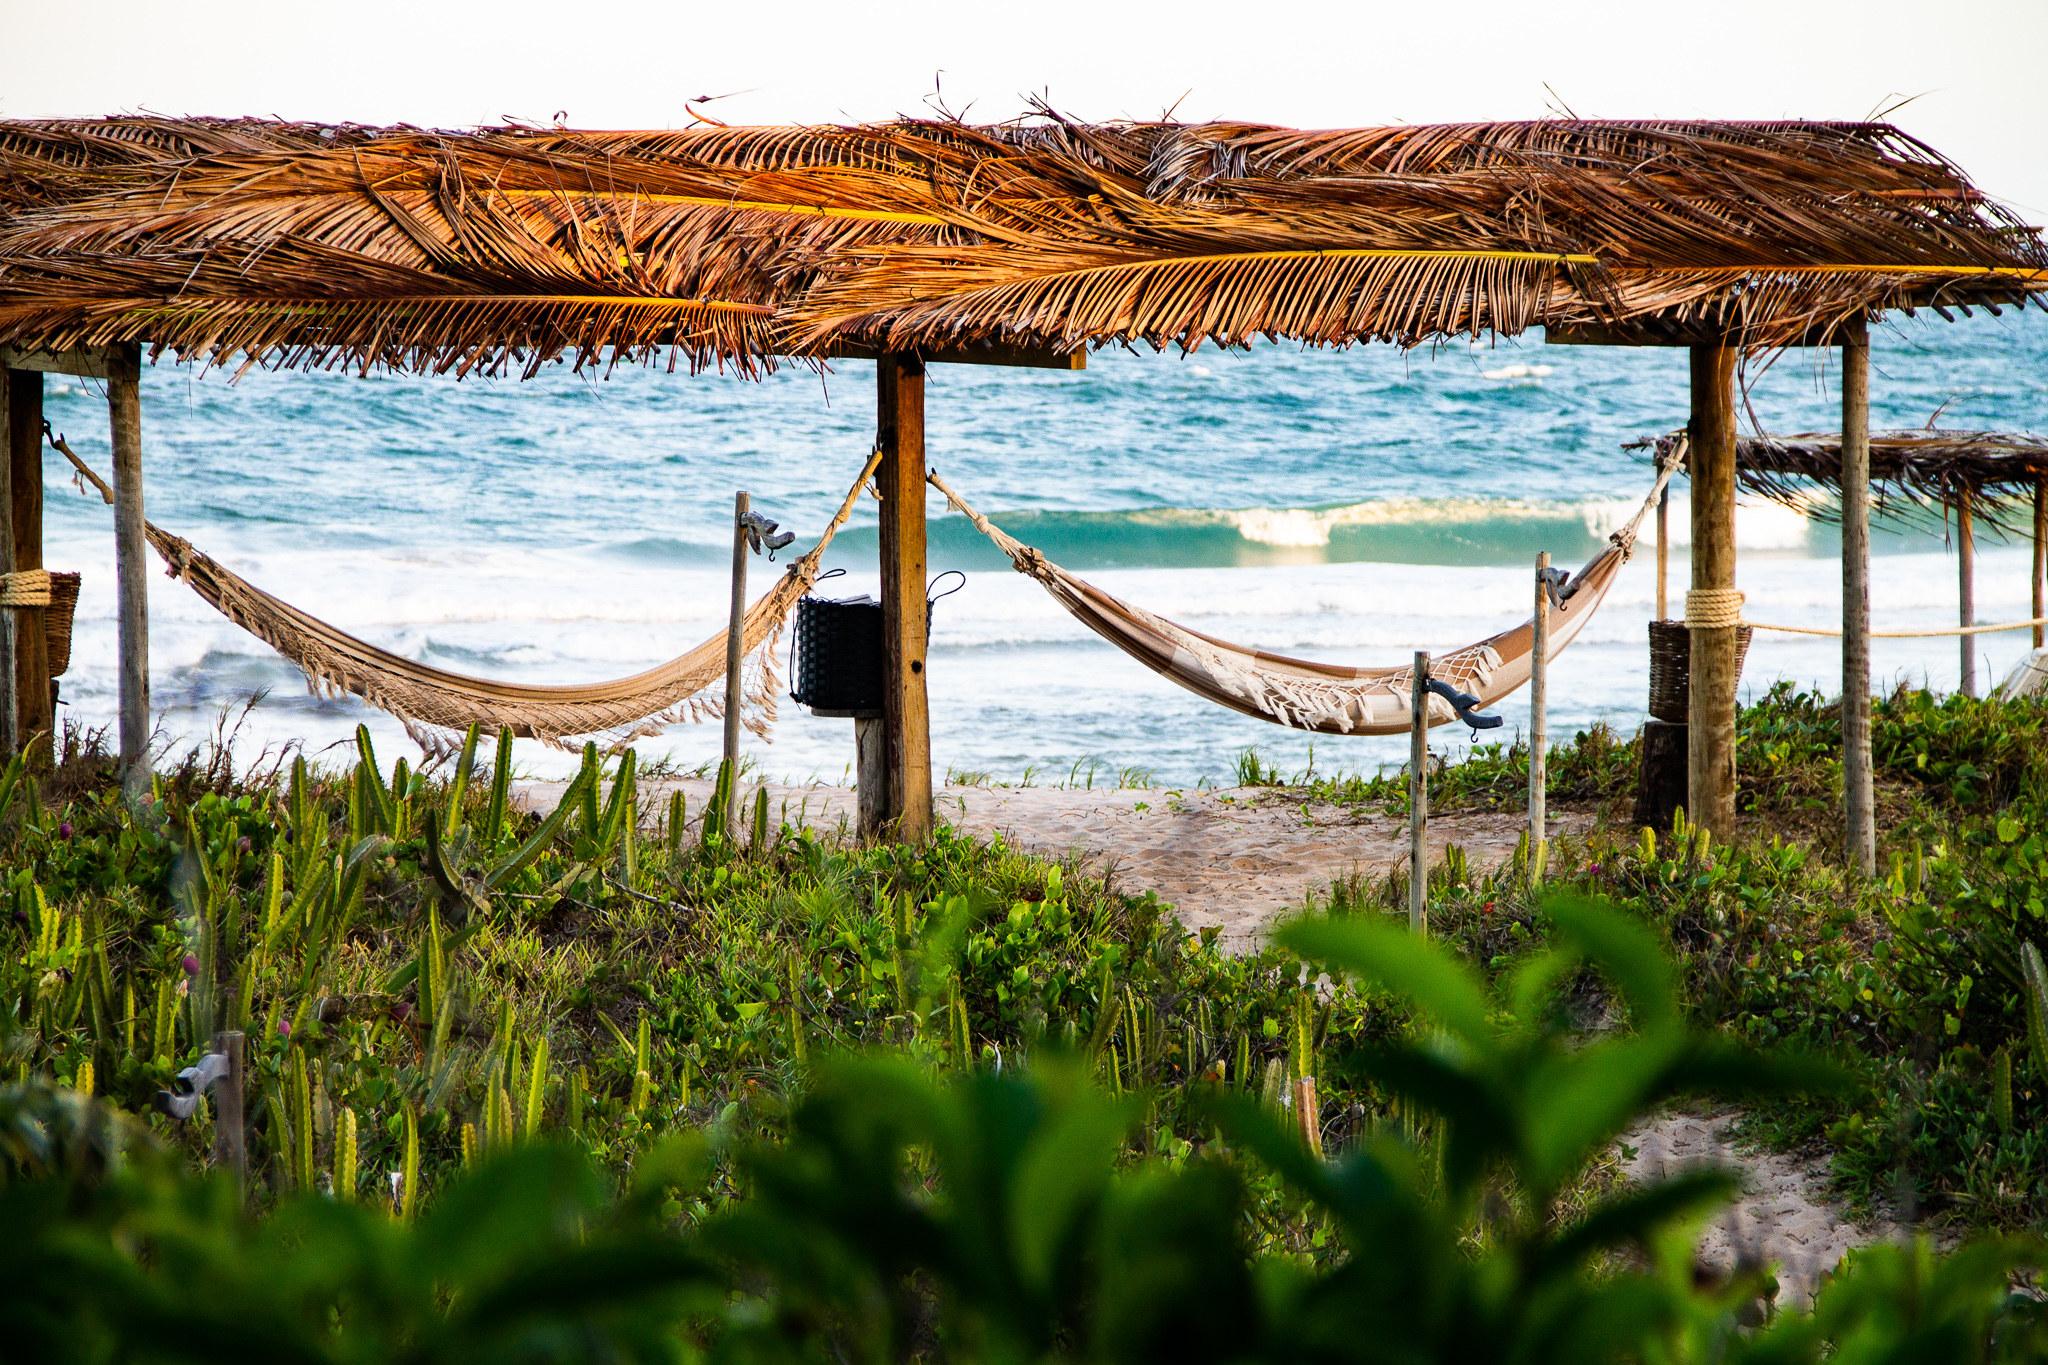 Two hammocks hanging on the beach